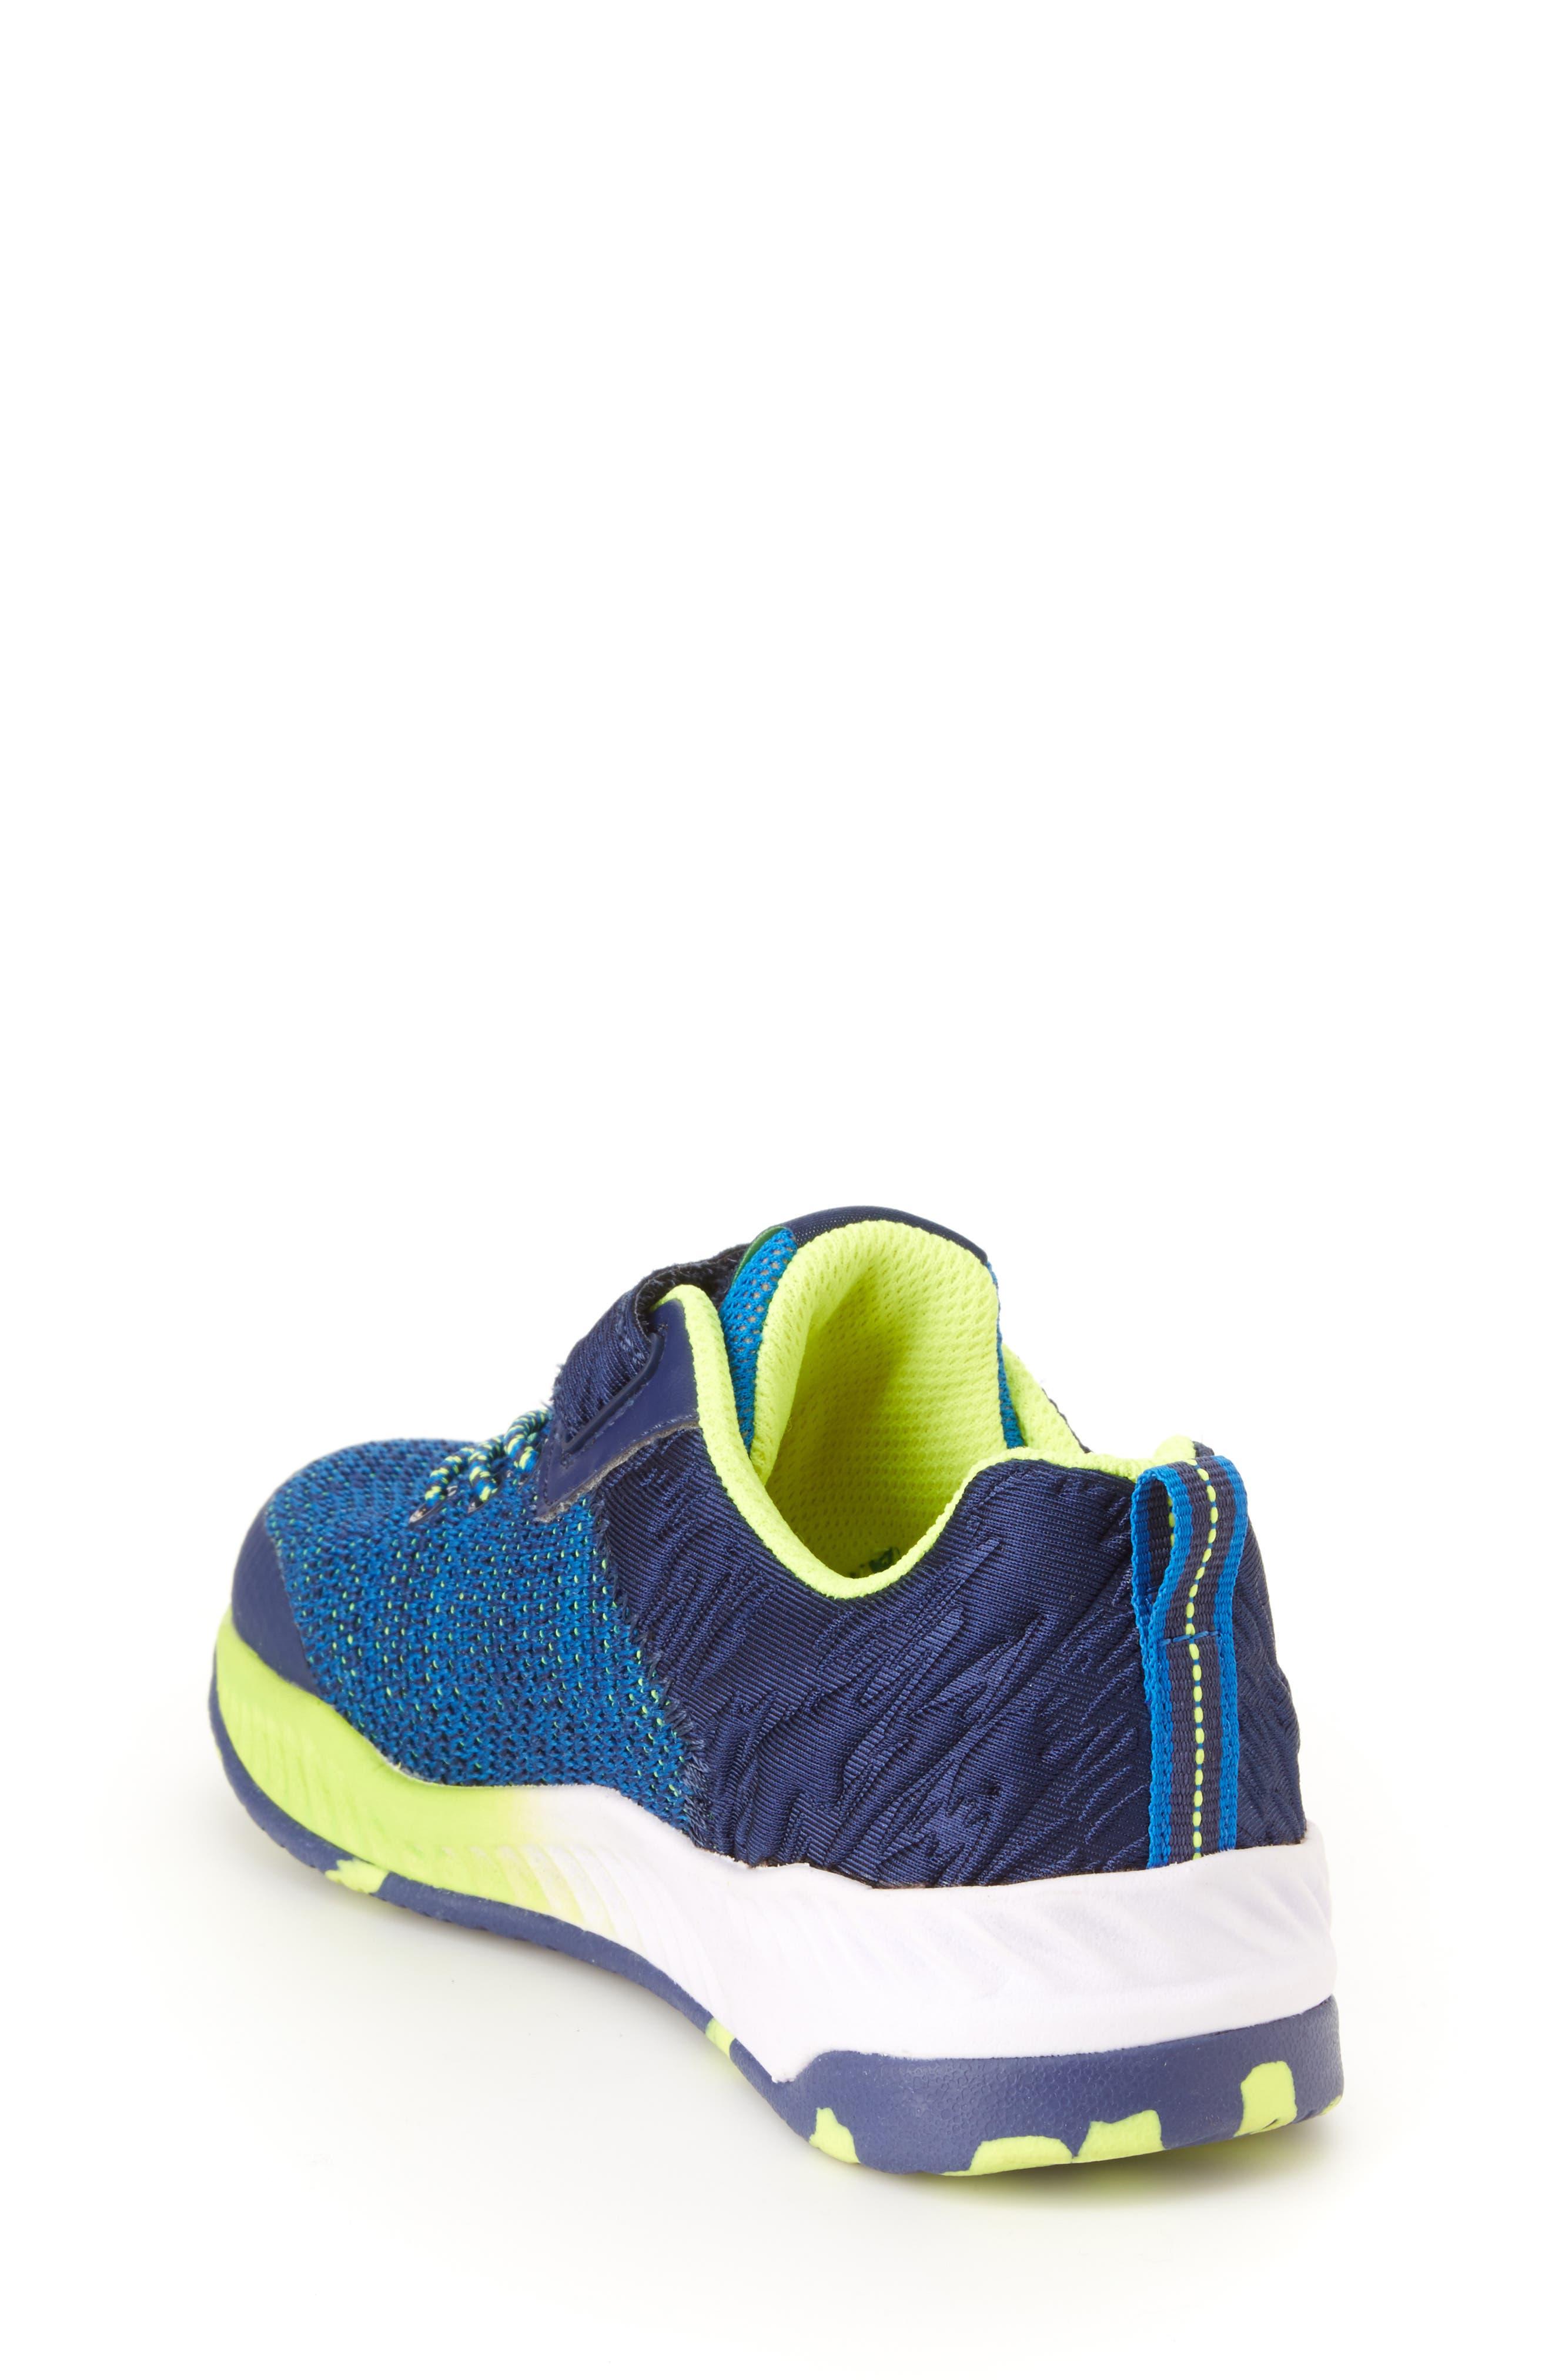 Talon Knit Sneaker,                             Alternate thumbnail 2, color,                             NAVY TEXTILE